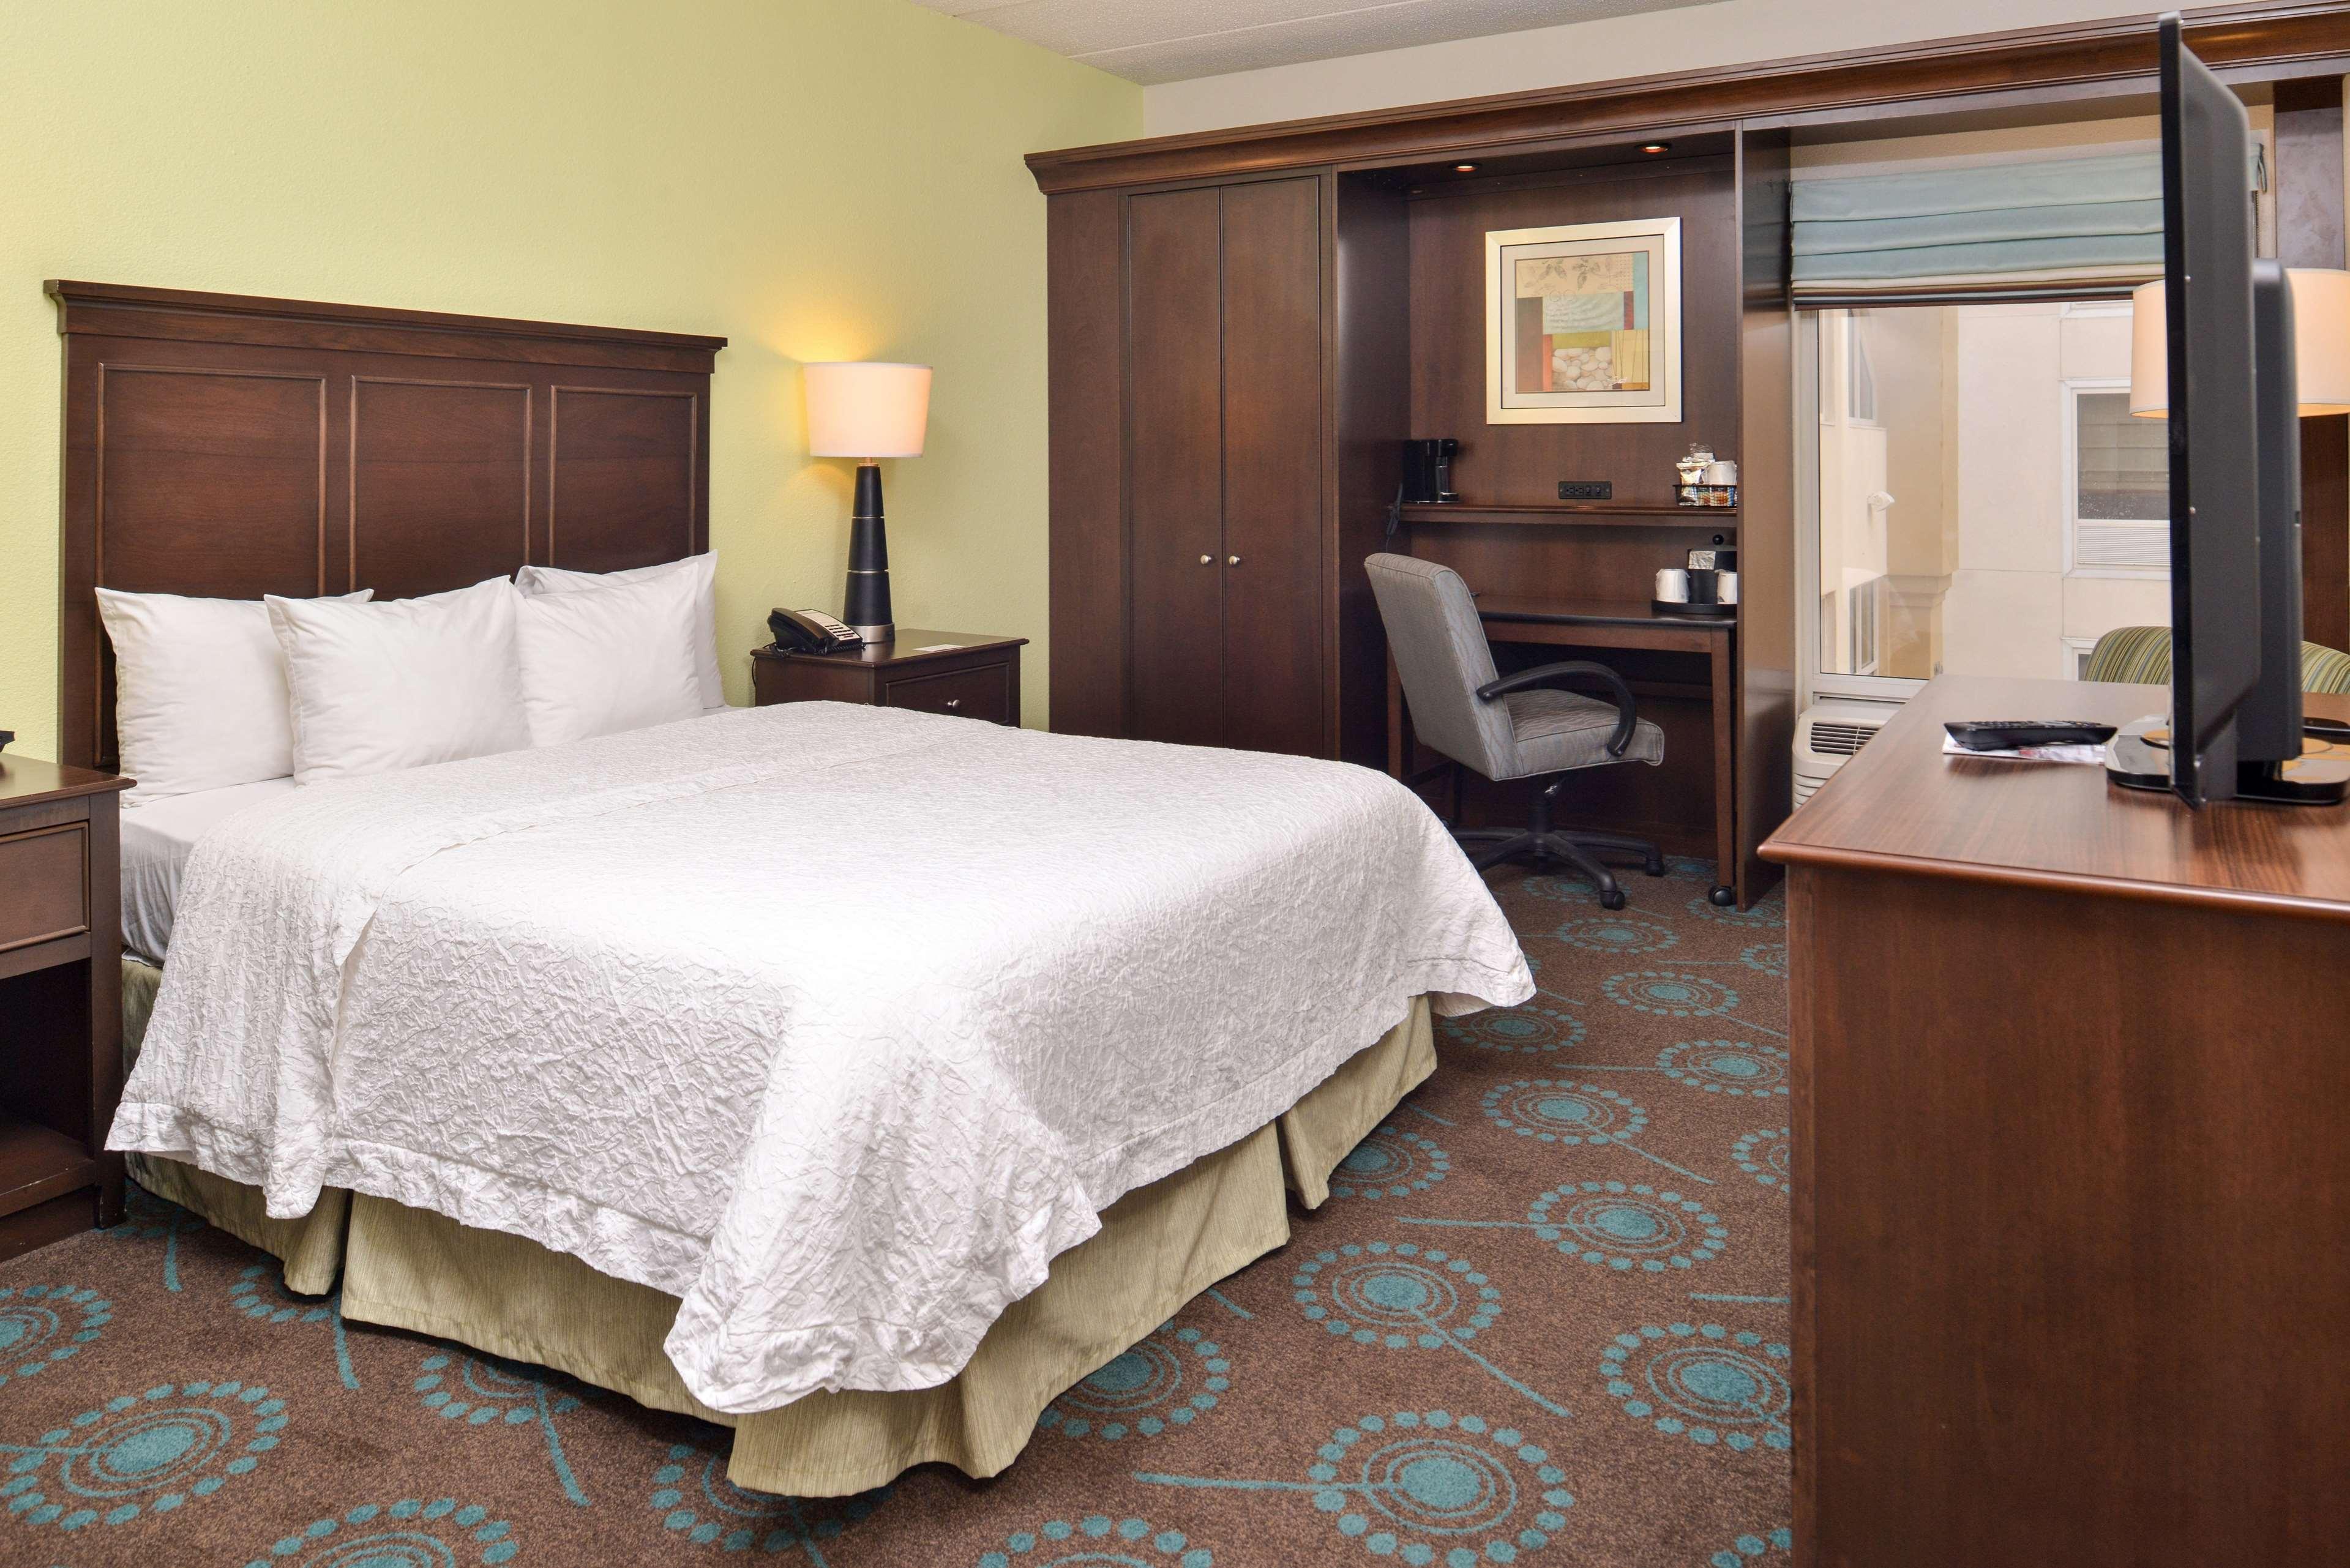 Hampton Inn & Suites Newport News (Oyster Point) image 38